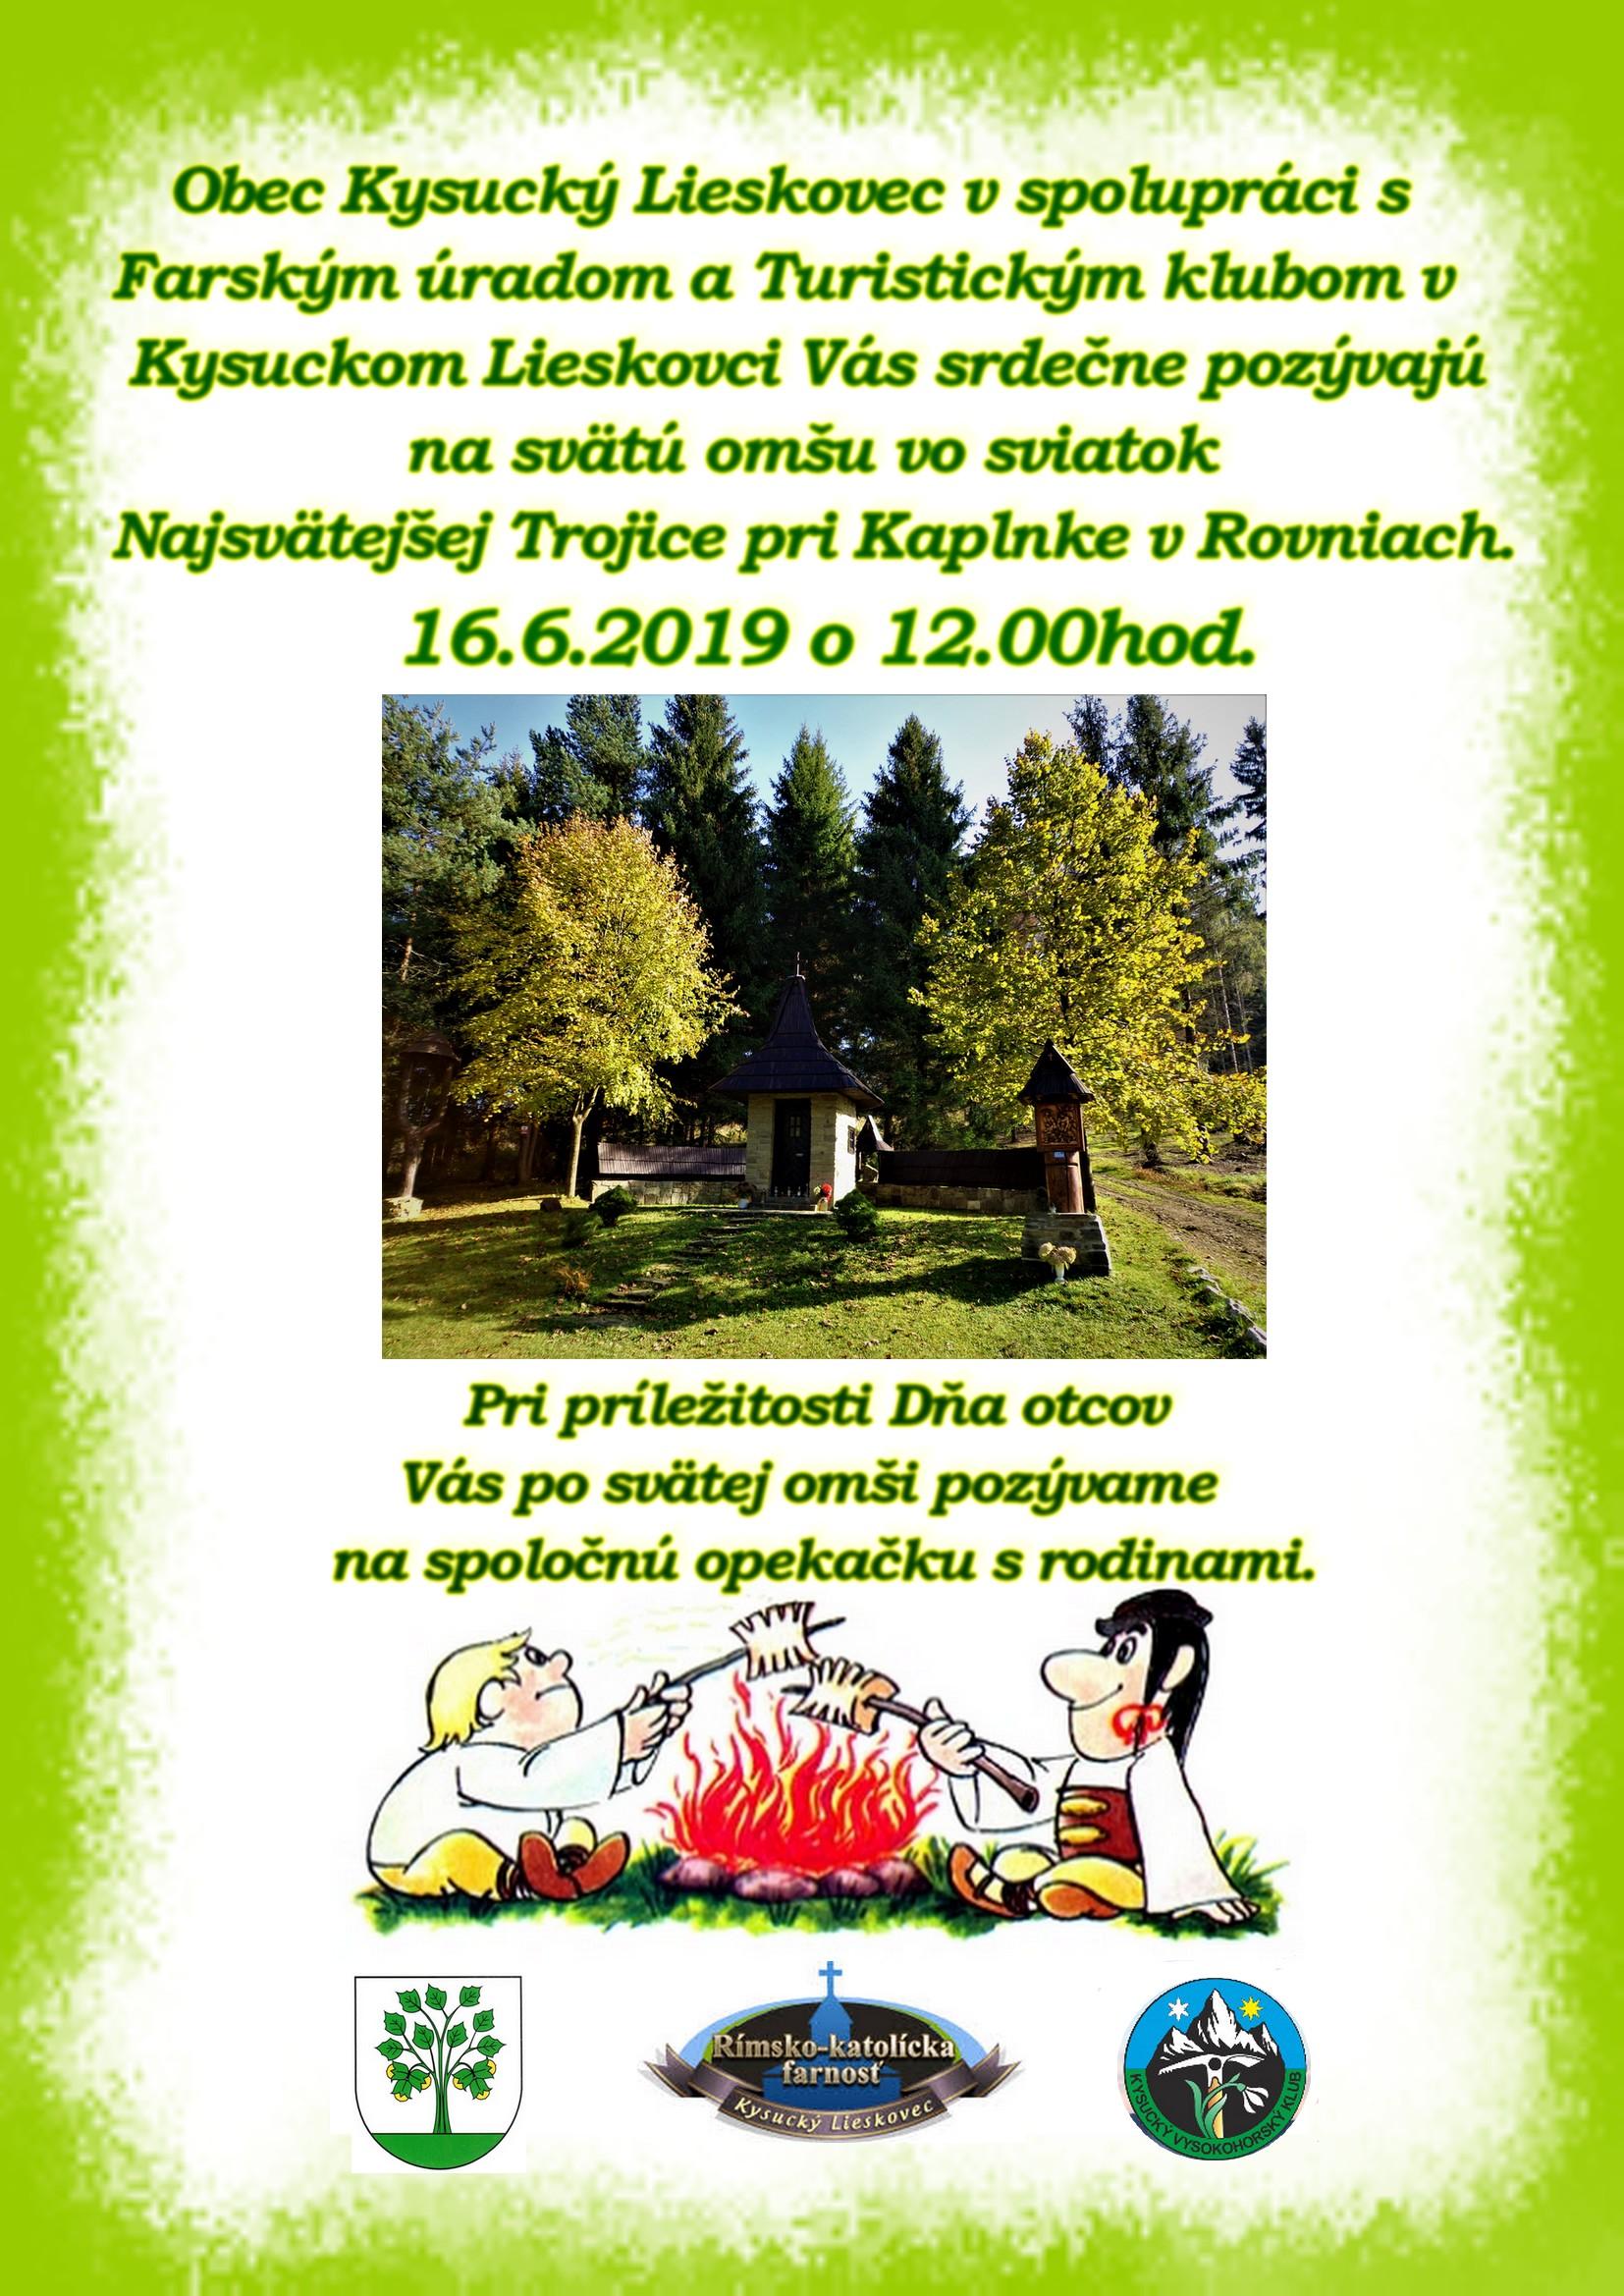 Kysucky Lieskovec村与教区办公室和Kysucky Lieskovec的旅游俱乐部合作,邀请您参观Rovne教堂的圣三一节。 2019年6月16日中午12点